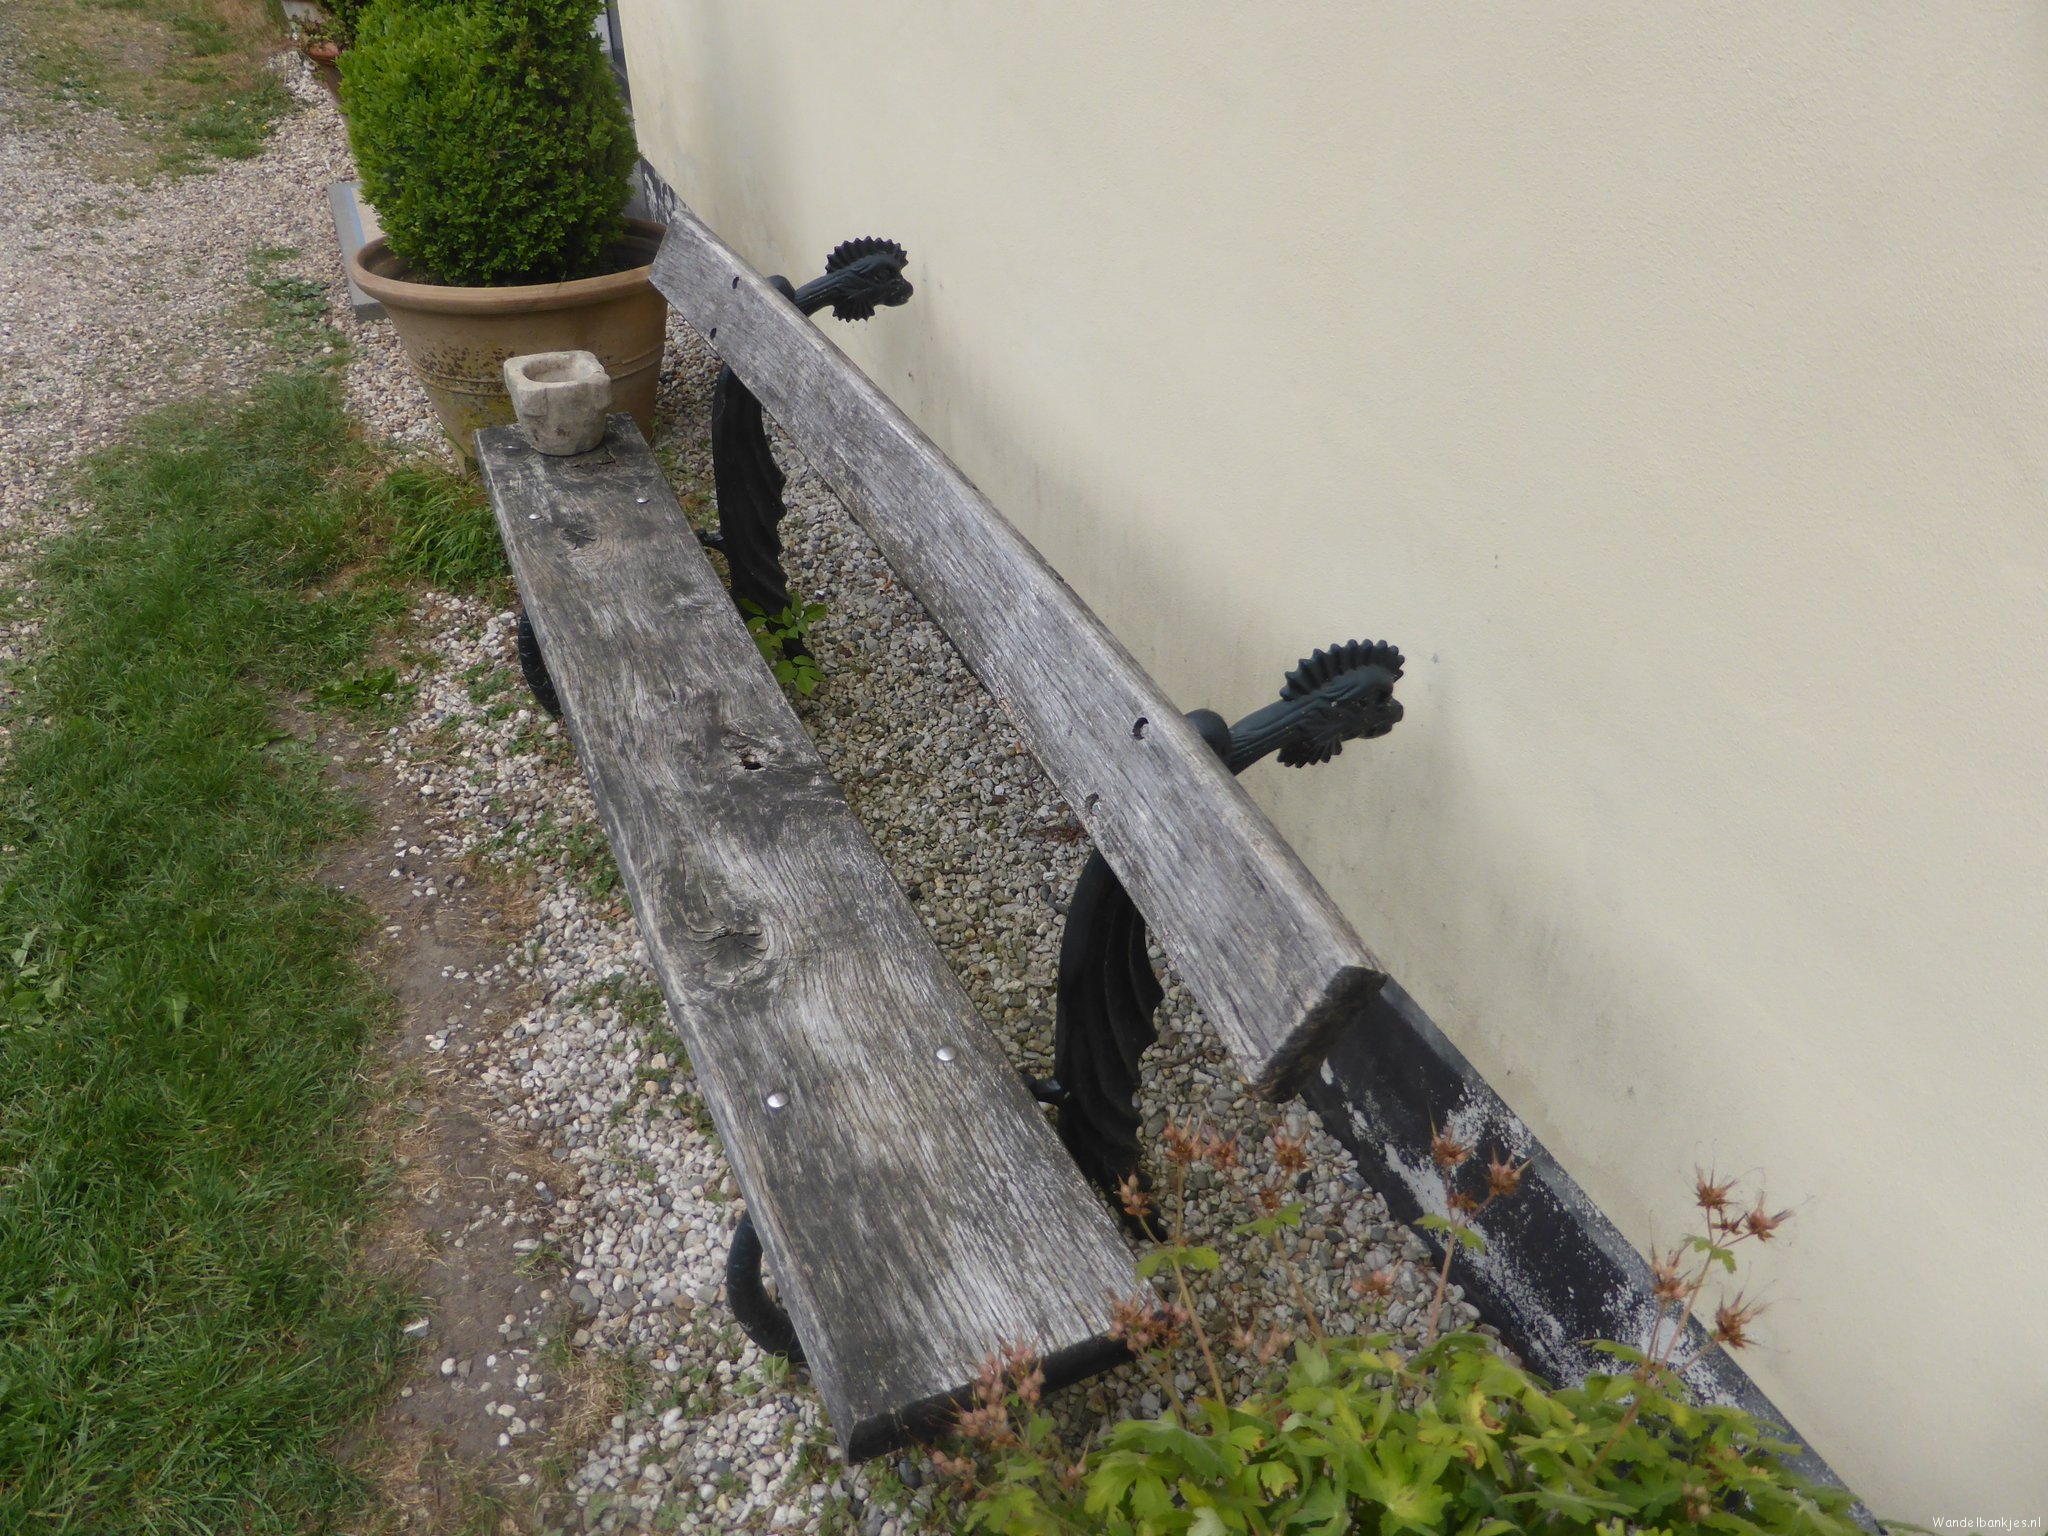 Rt-willemwandelt-netherlands-utrecht-thorn-castle-strongenburg-stools-stools-coach-house-httpst-coekhvncg